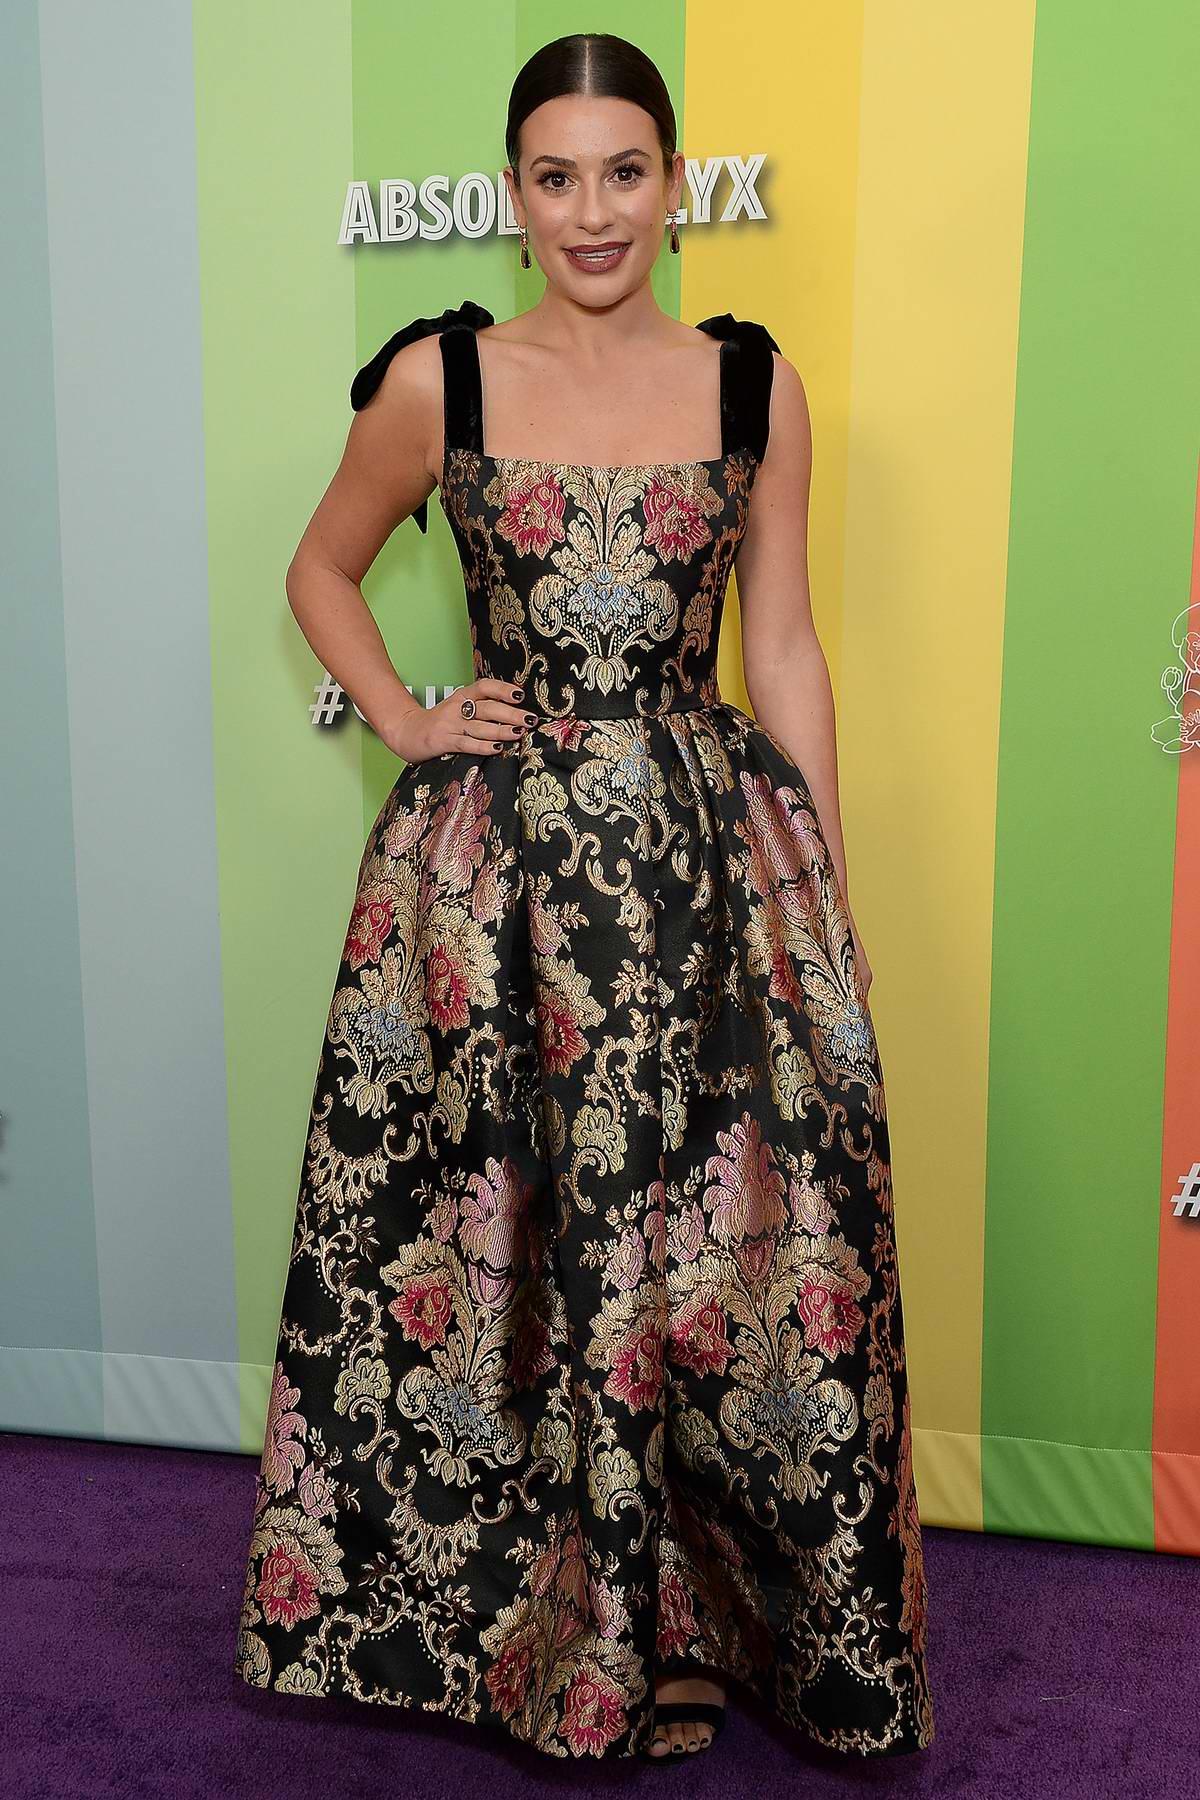 Lea Michele attends the 2019 amfAR Inspiration Gala at Milk Studios in Los Angeles